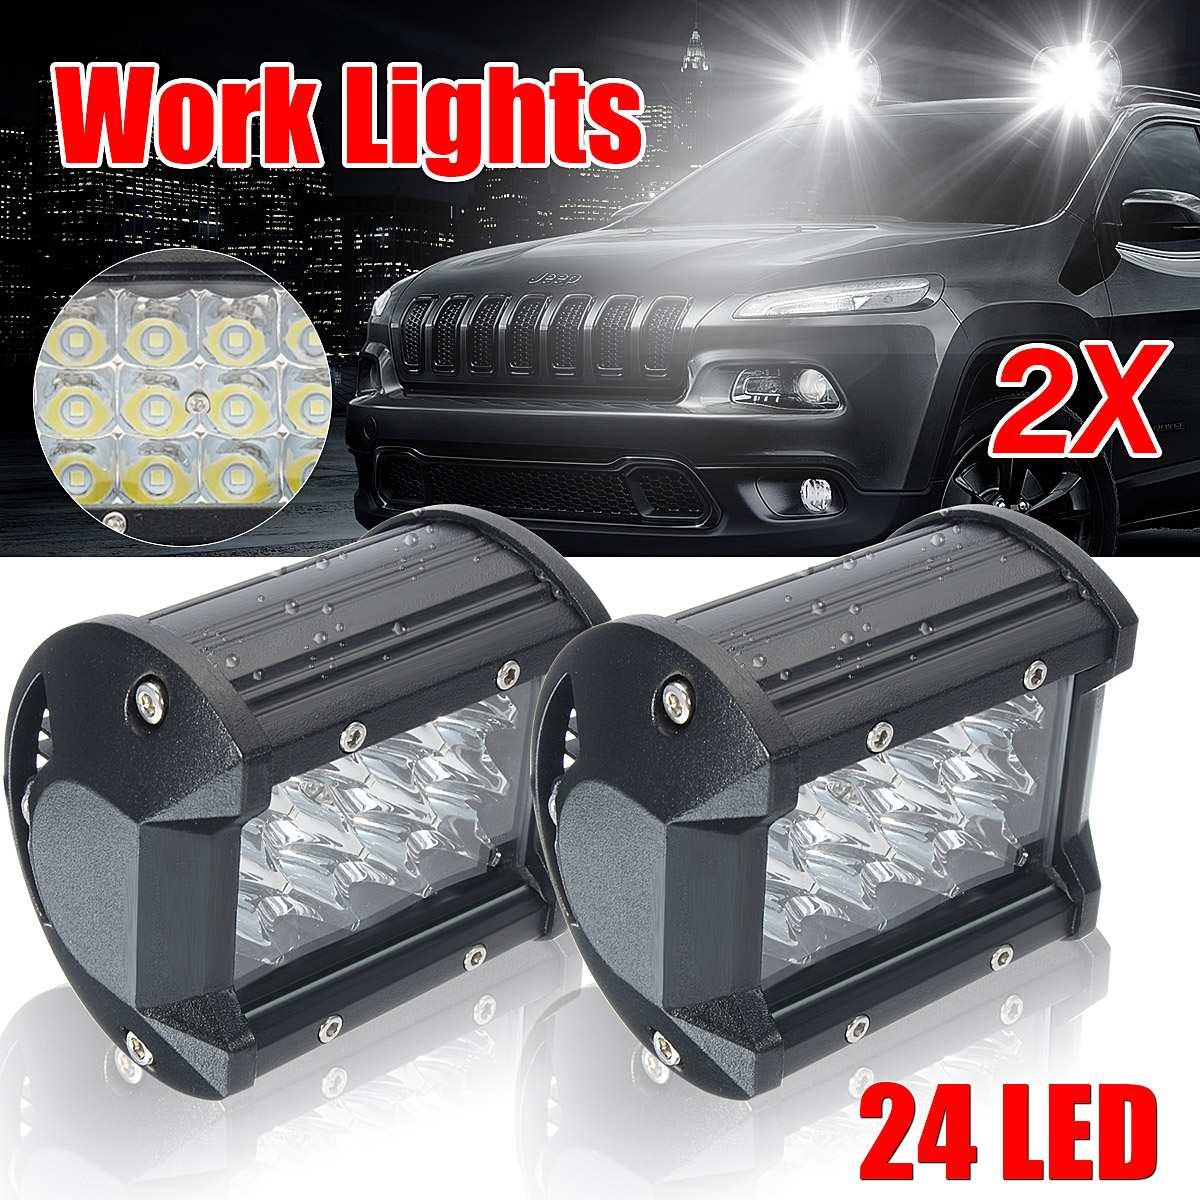 5 Inch 72W 12LED 6000K Car Light Spot Beam Waterproof Work Night Light Driving Fog Lamp Bar for Offroad ATV UTE SUV Super